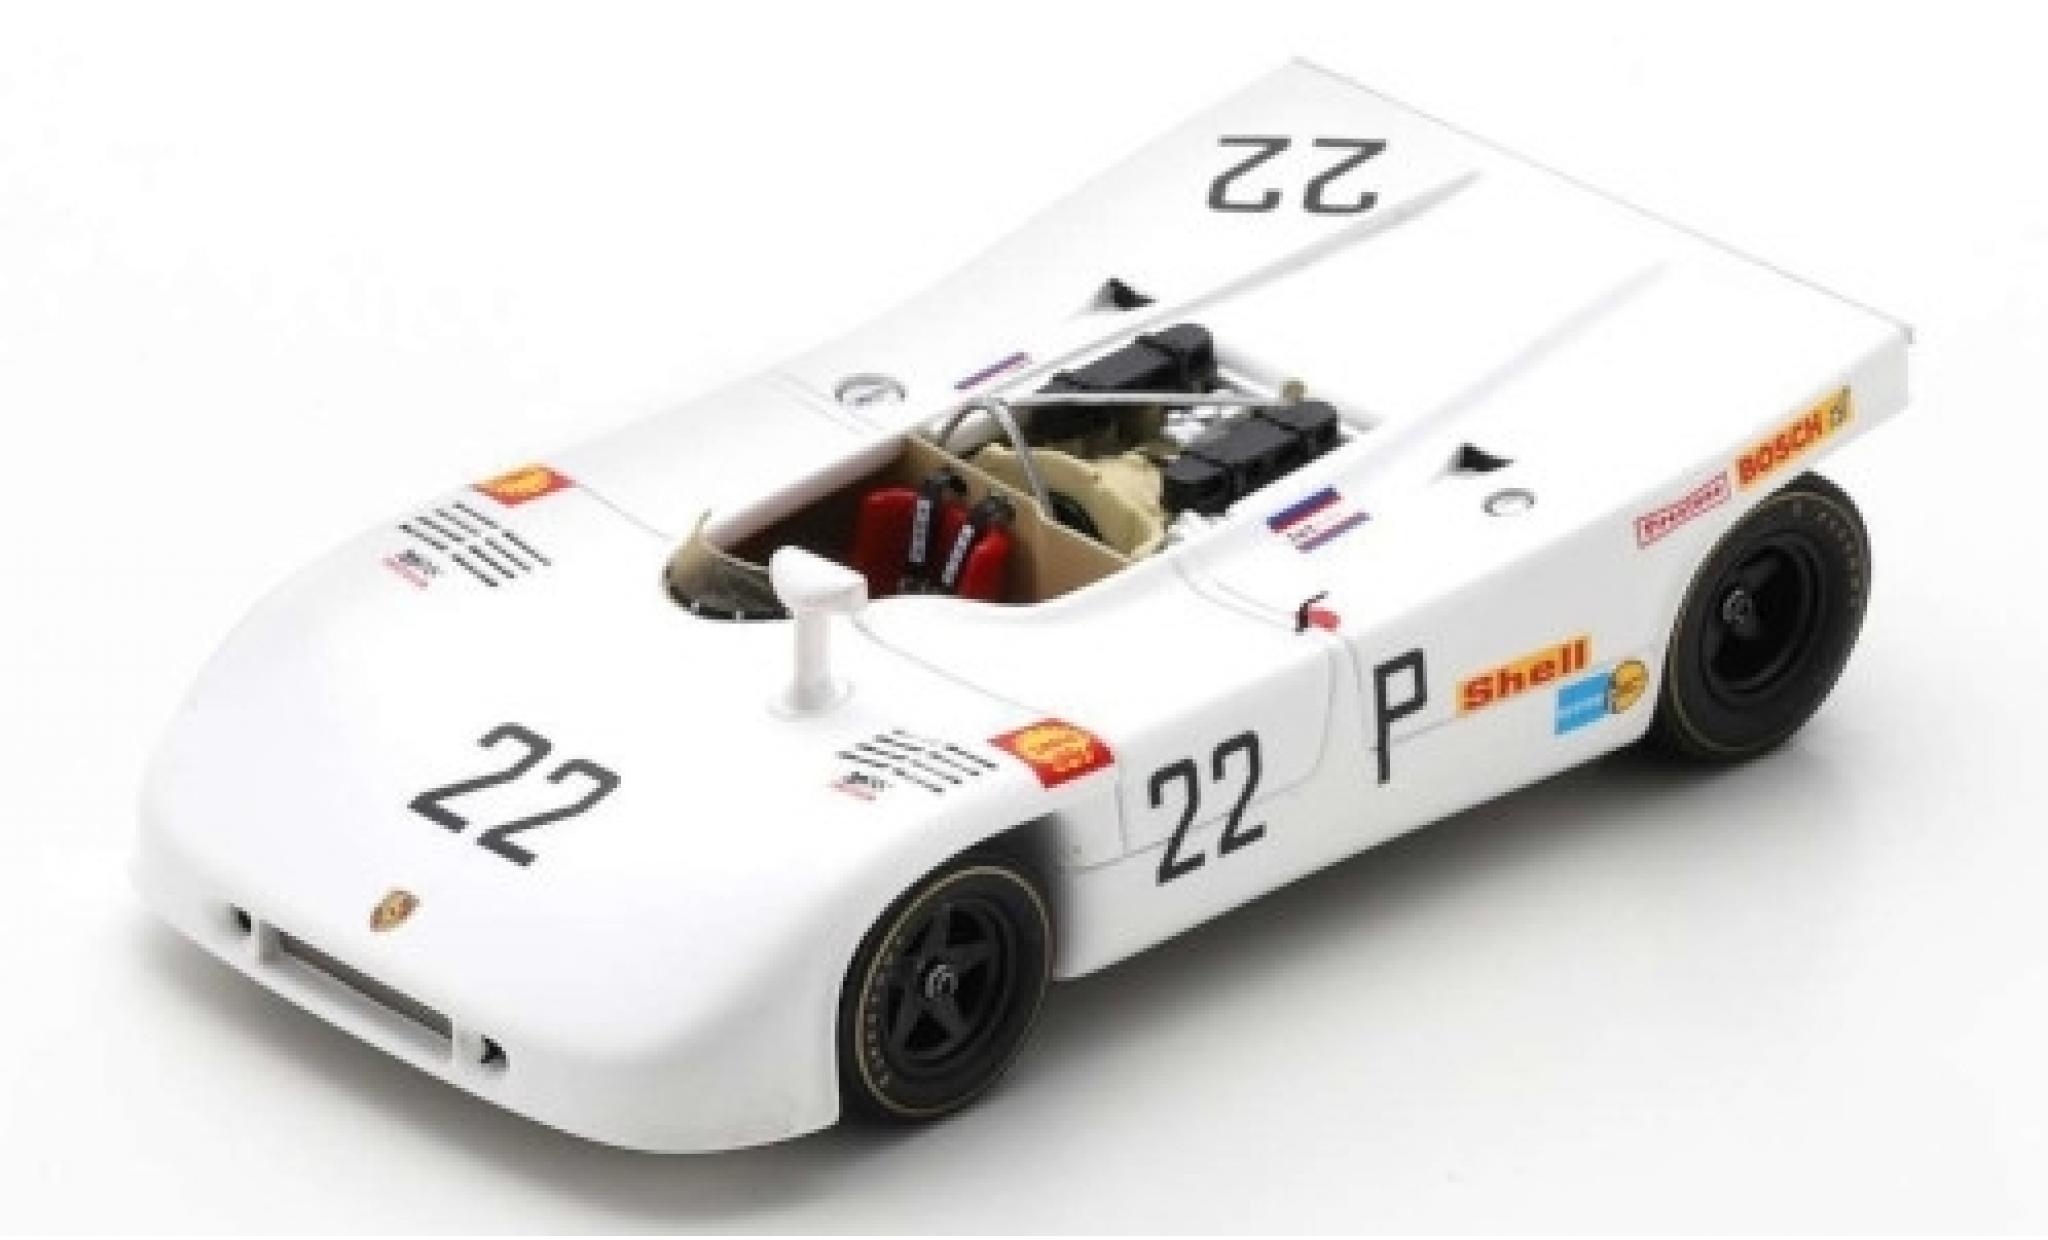 Porsche 908 1970 1/43 Spark /03 RHD No.22 Konstruktionen Salzburg 1000km Nürburgring V.Elford/K.Ahrens